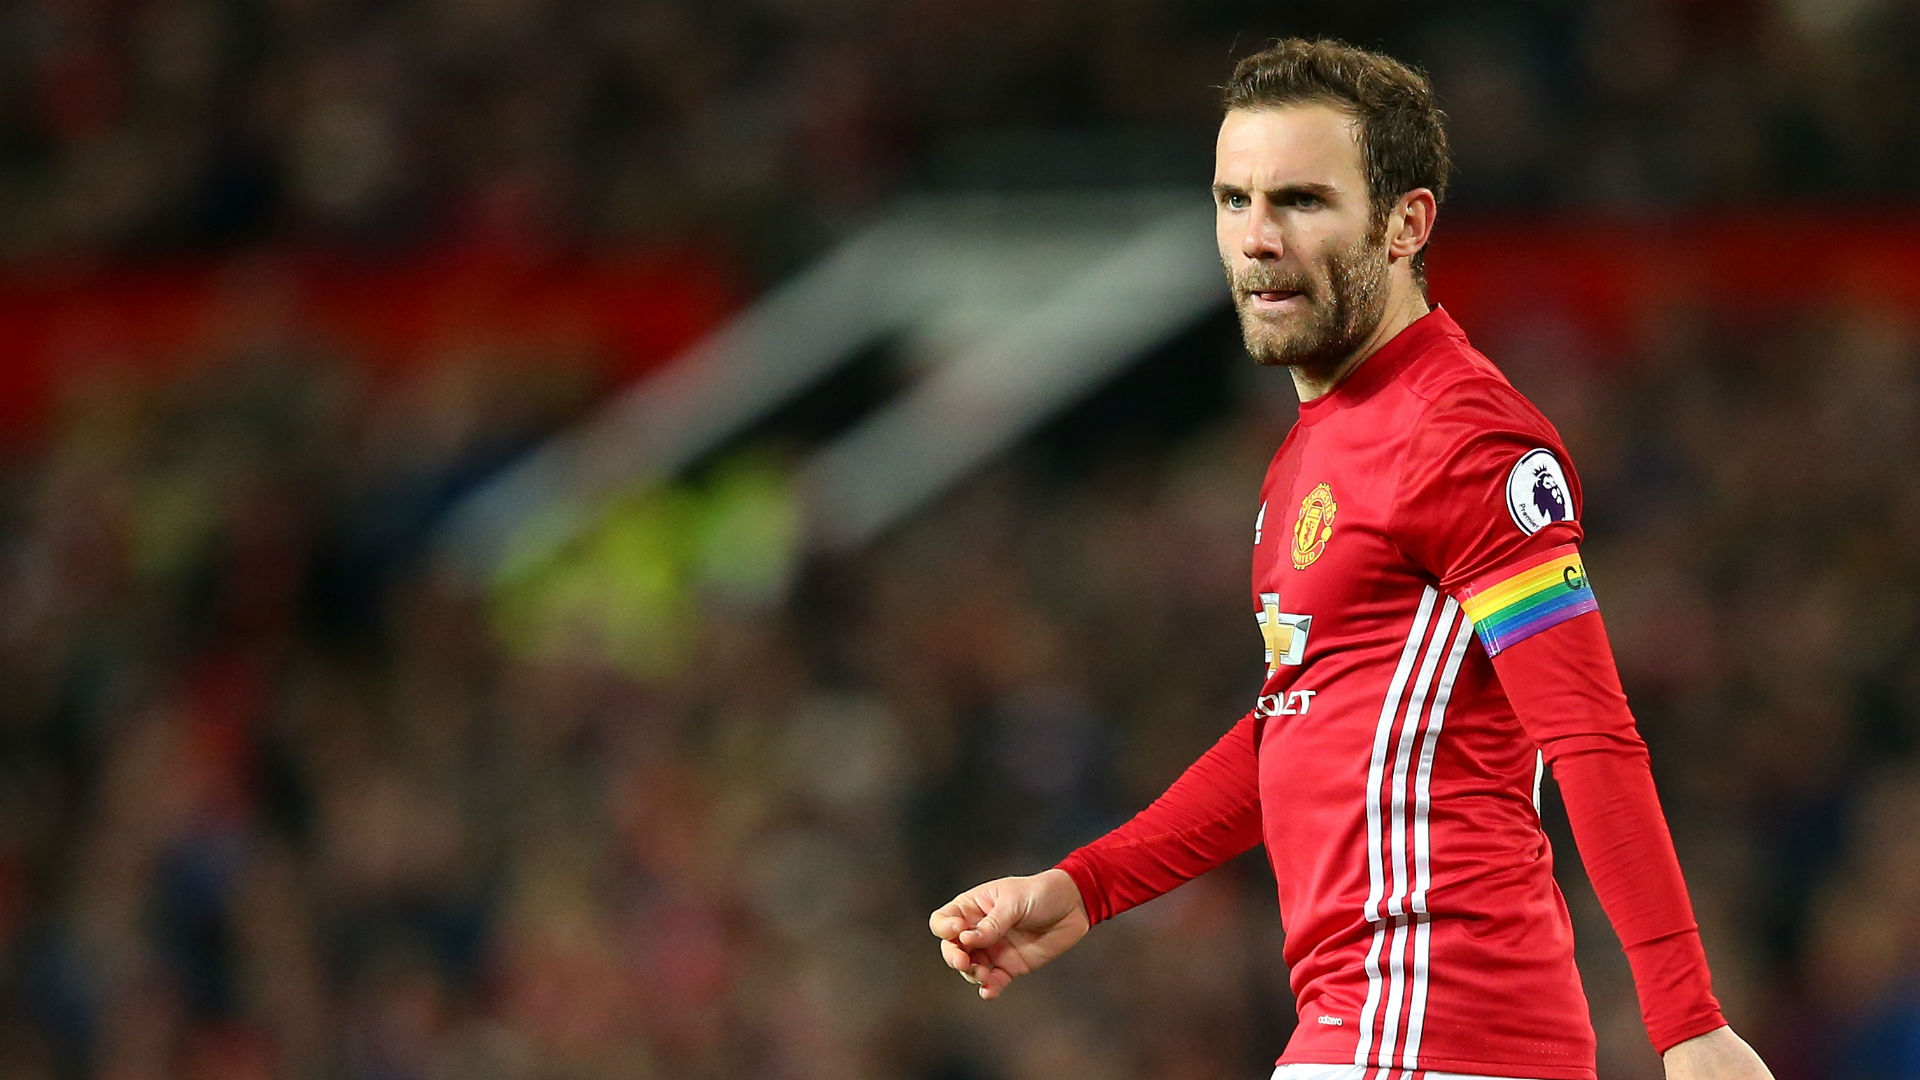 We will keep on trying' – Juan Mata reures Manchester United fans Juan Mata on kevin de bruyne, andrew carroll, real madrid castilla, ashley young, paula mata, gervais yao kouassi, spain national football team,